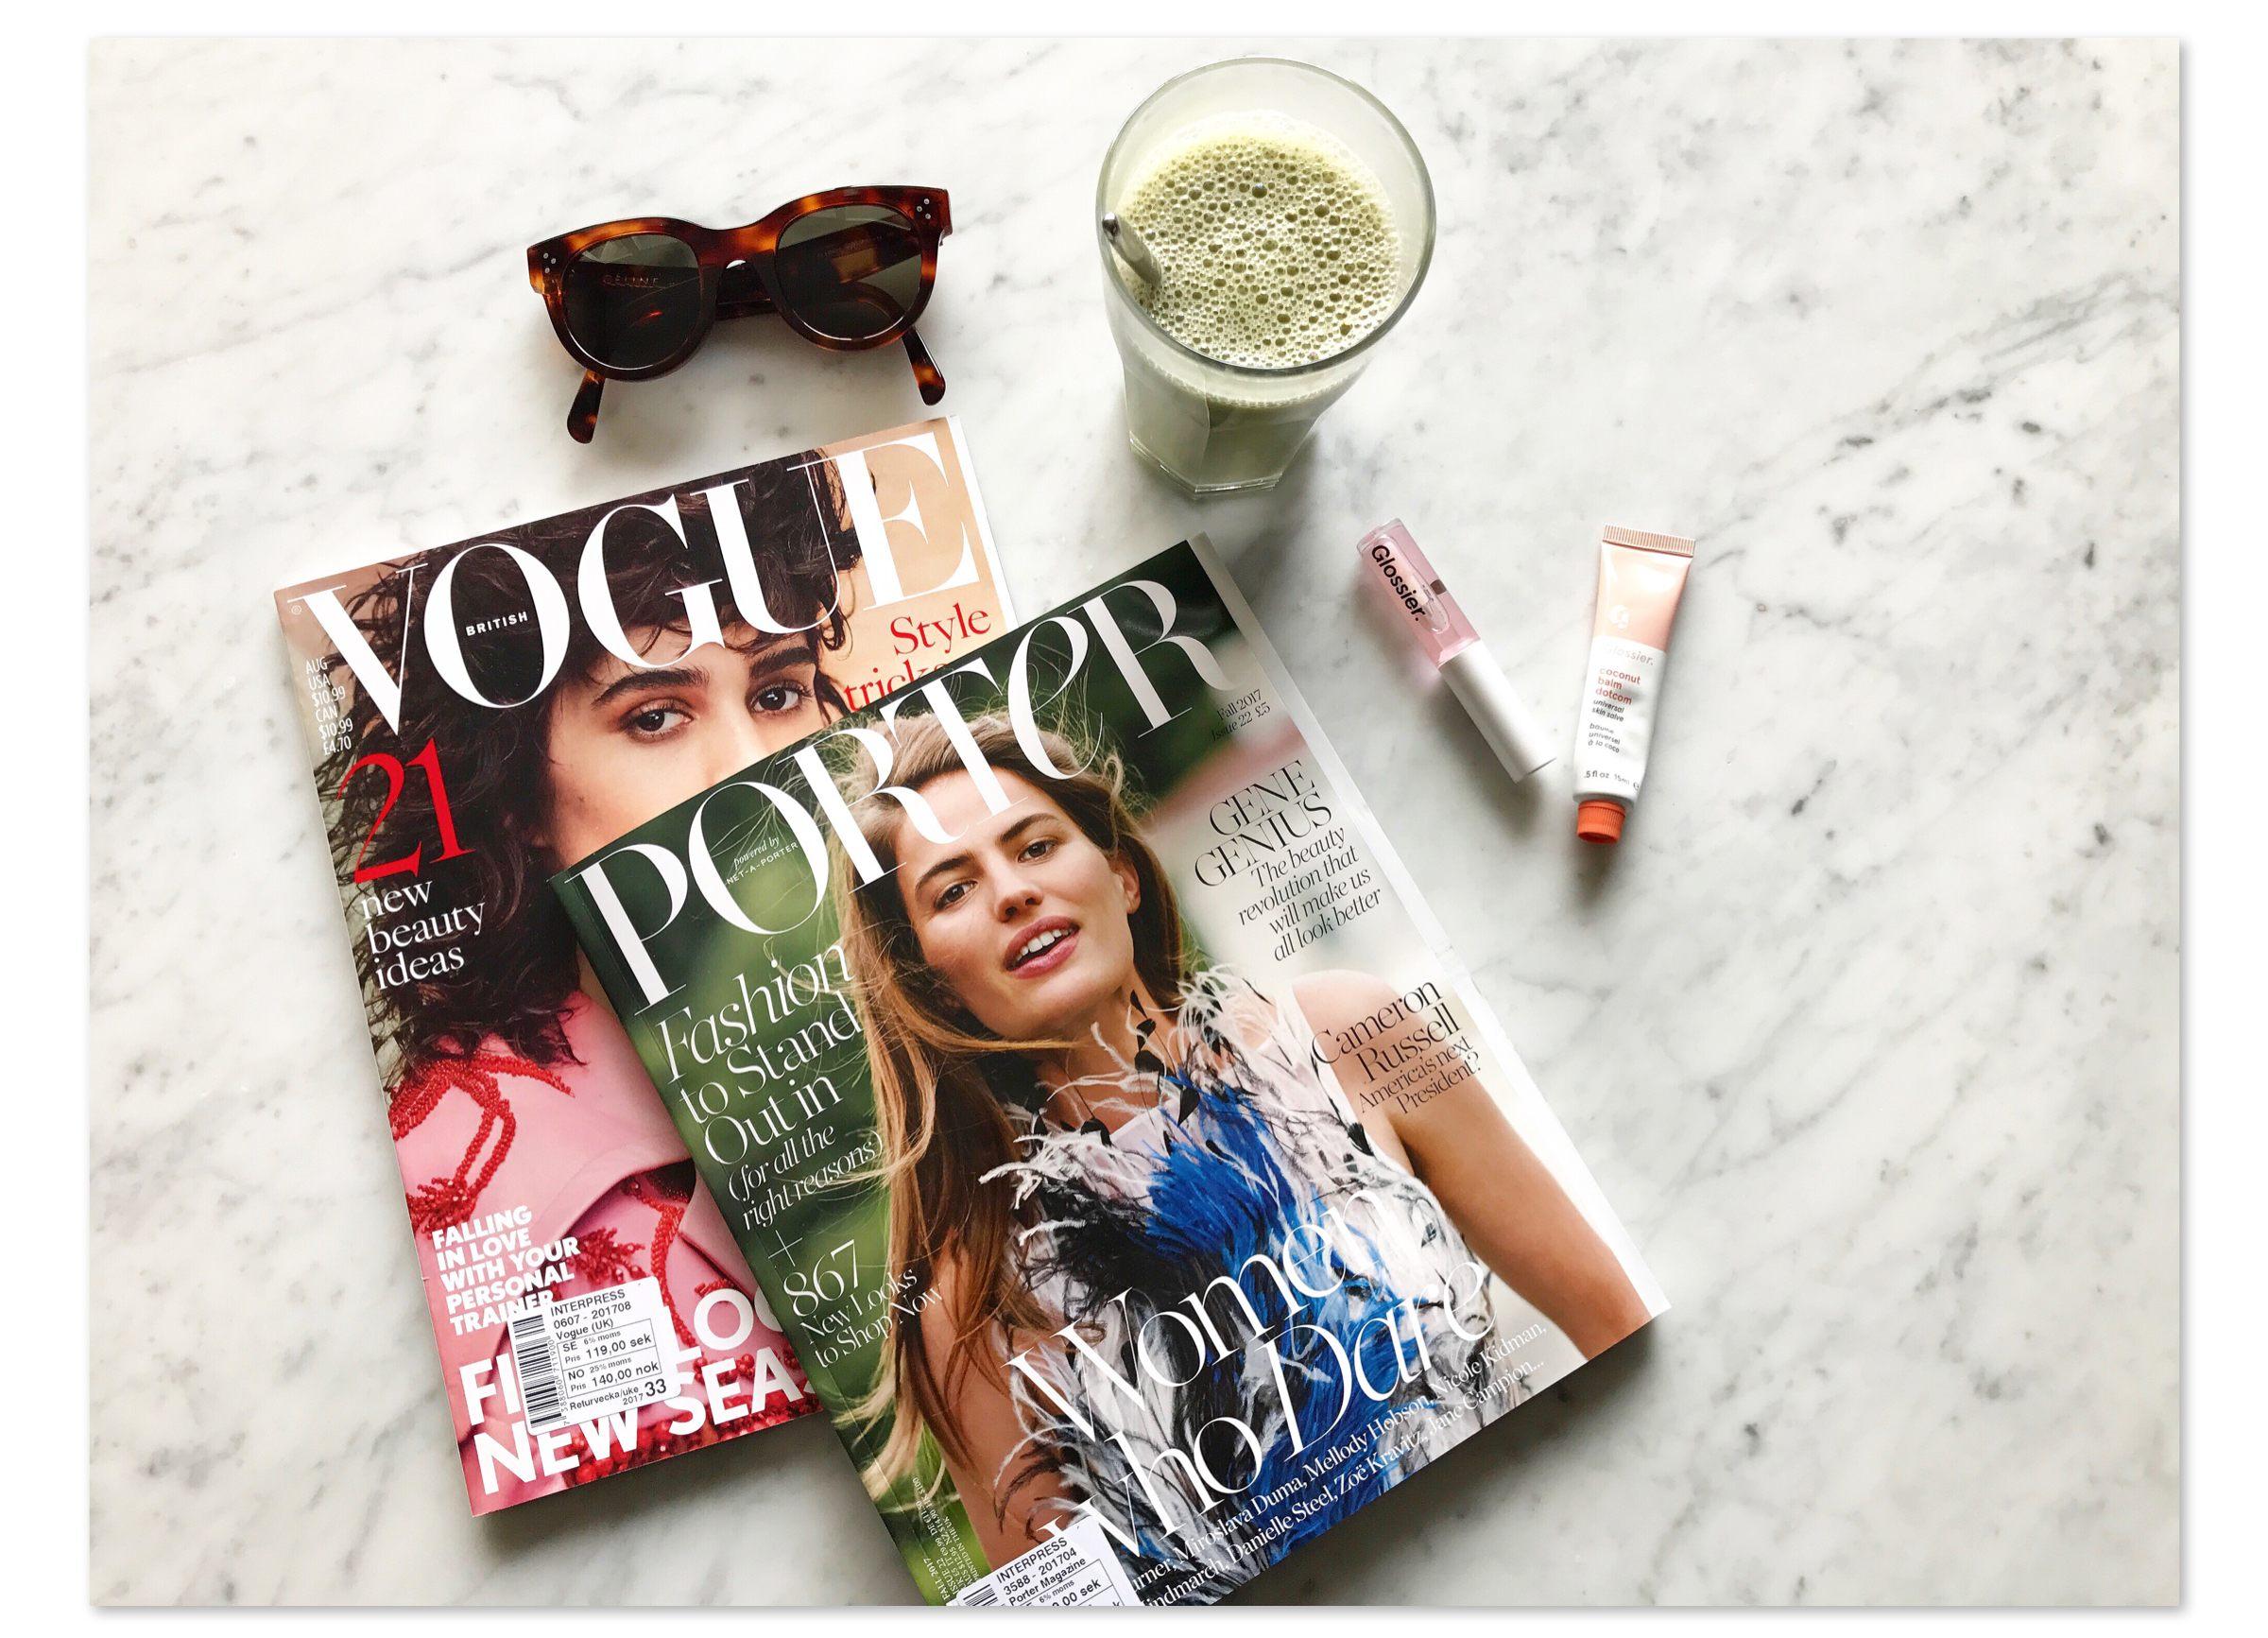 vogue porter magazines celine sunglasses matcha latte